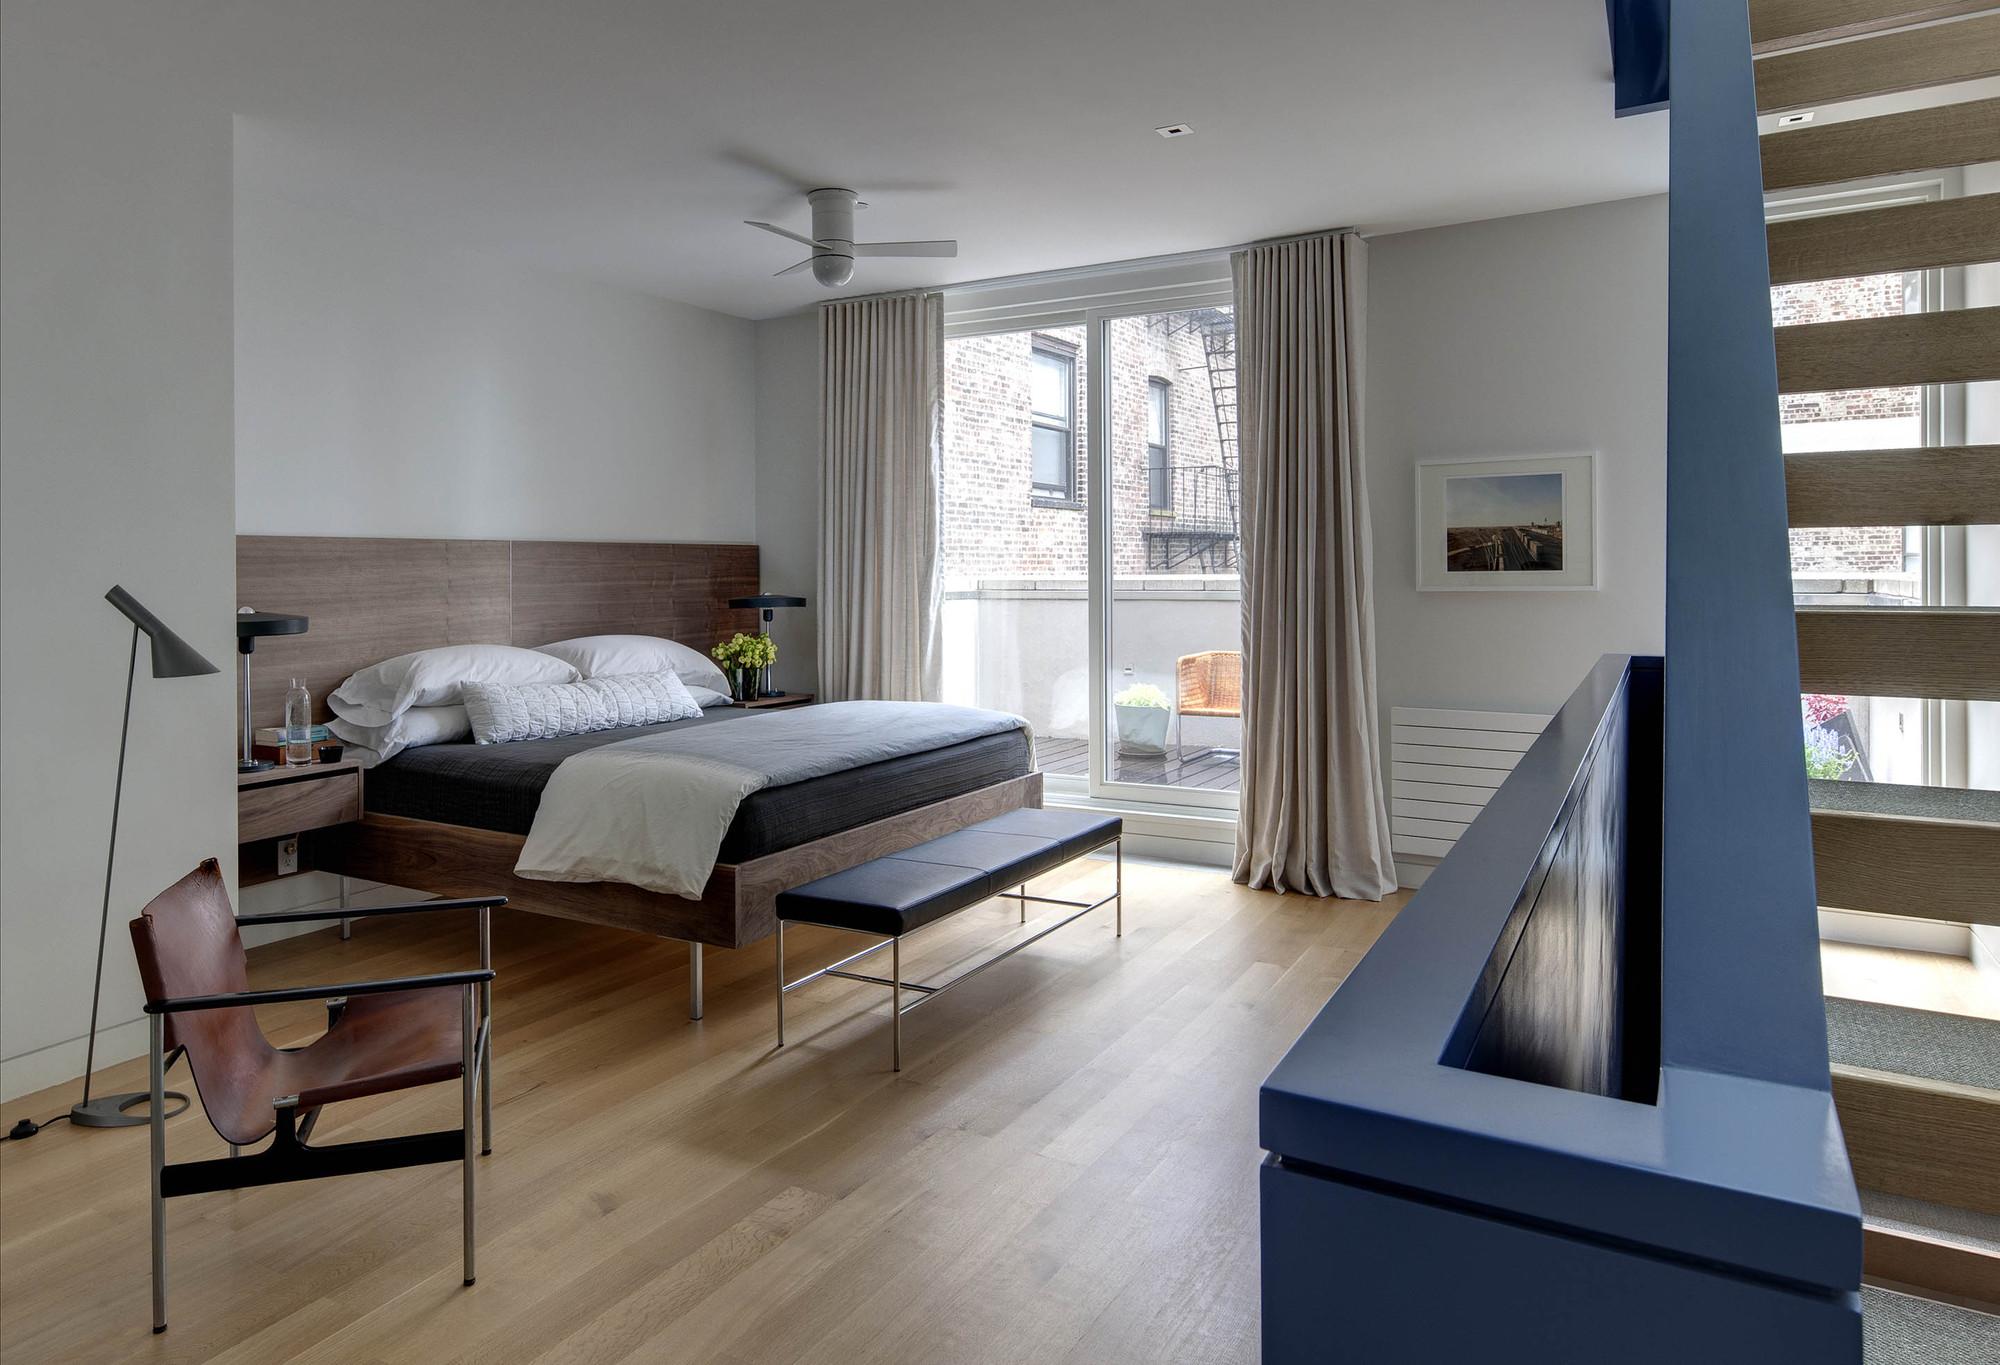 gallery of state street townhouse ben hansen architect 14. Black Bedroom Furniture Sets. Home Design Ideas